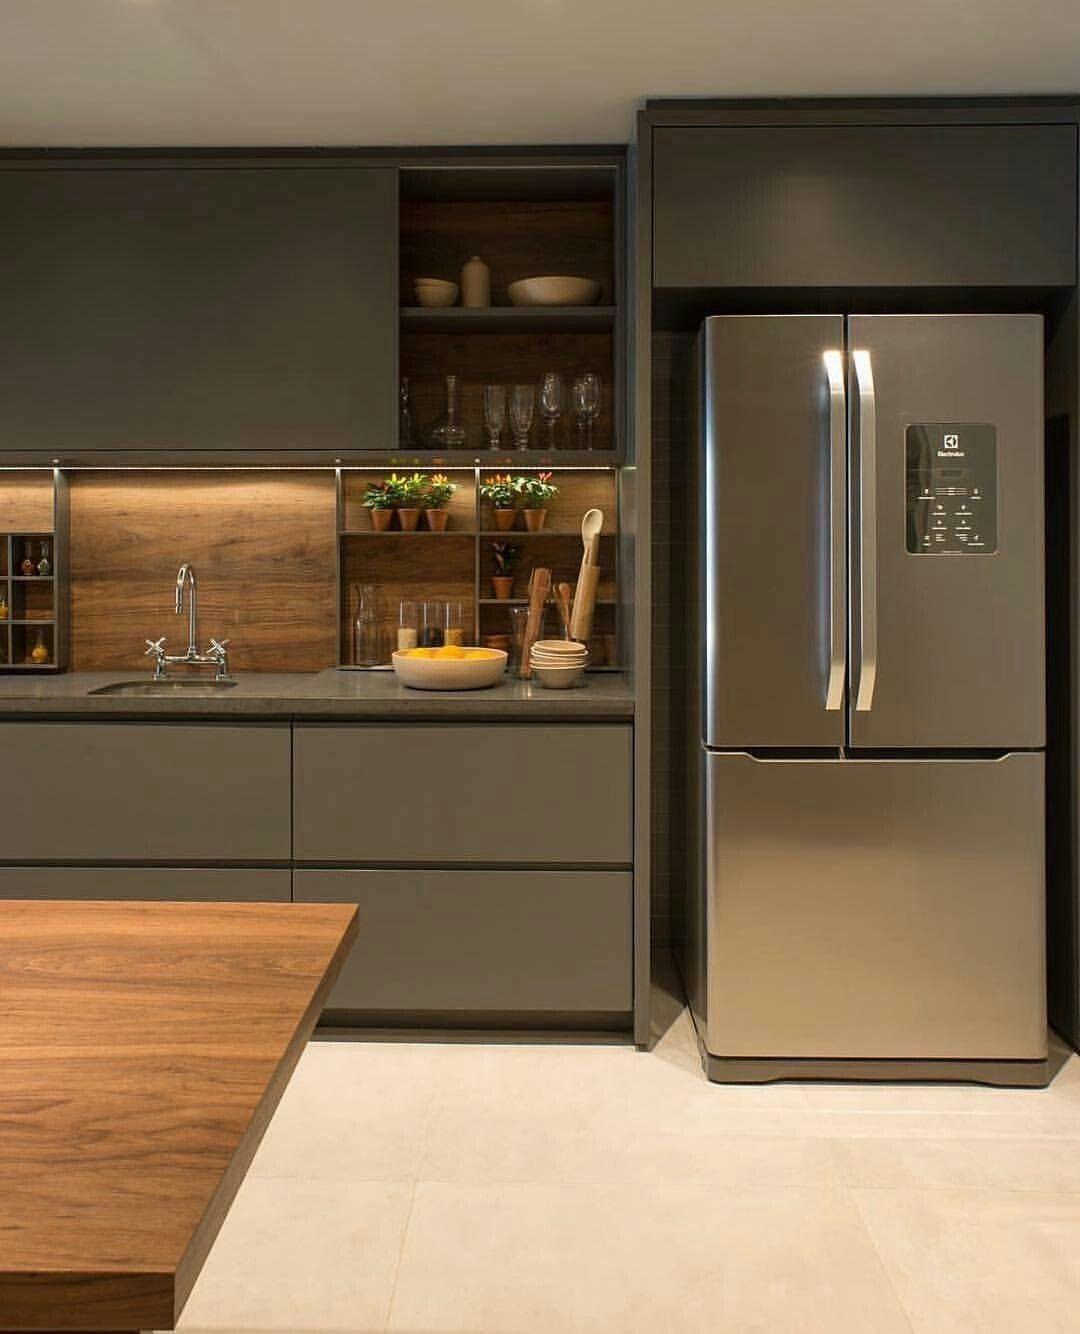 Kitchen Design Inspiration: Kitchen Inspiration The Definitive Source For Interior